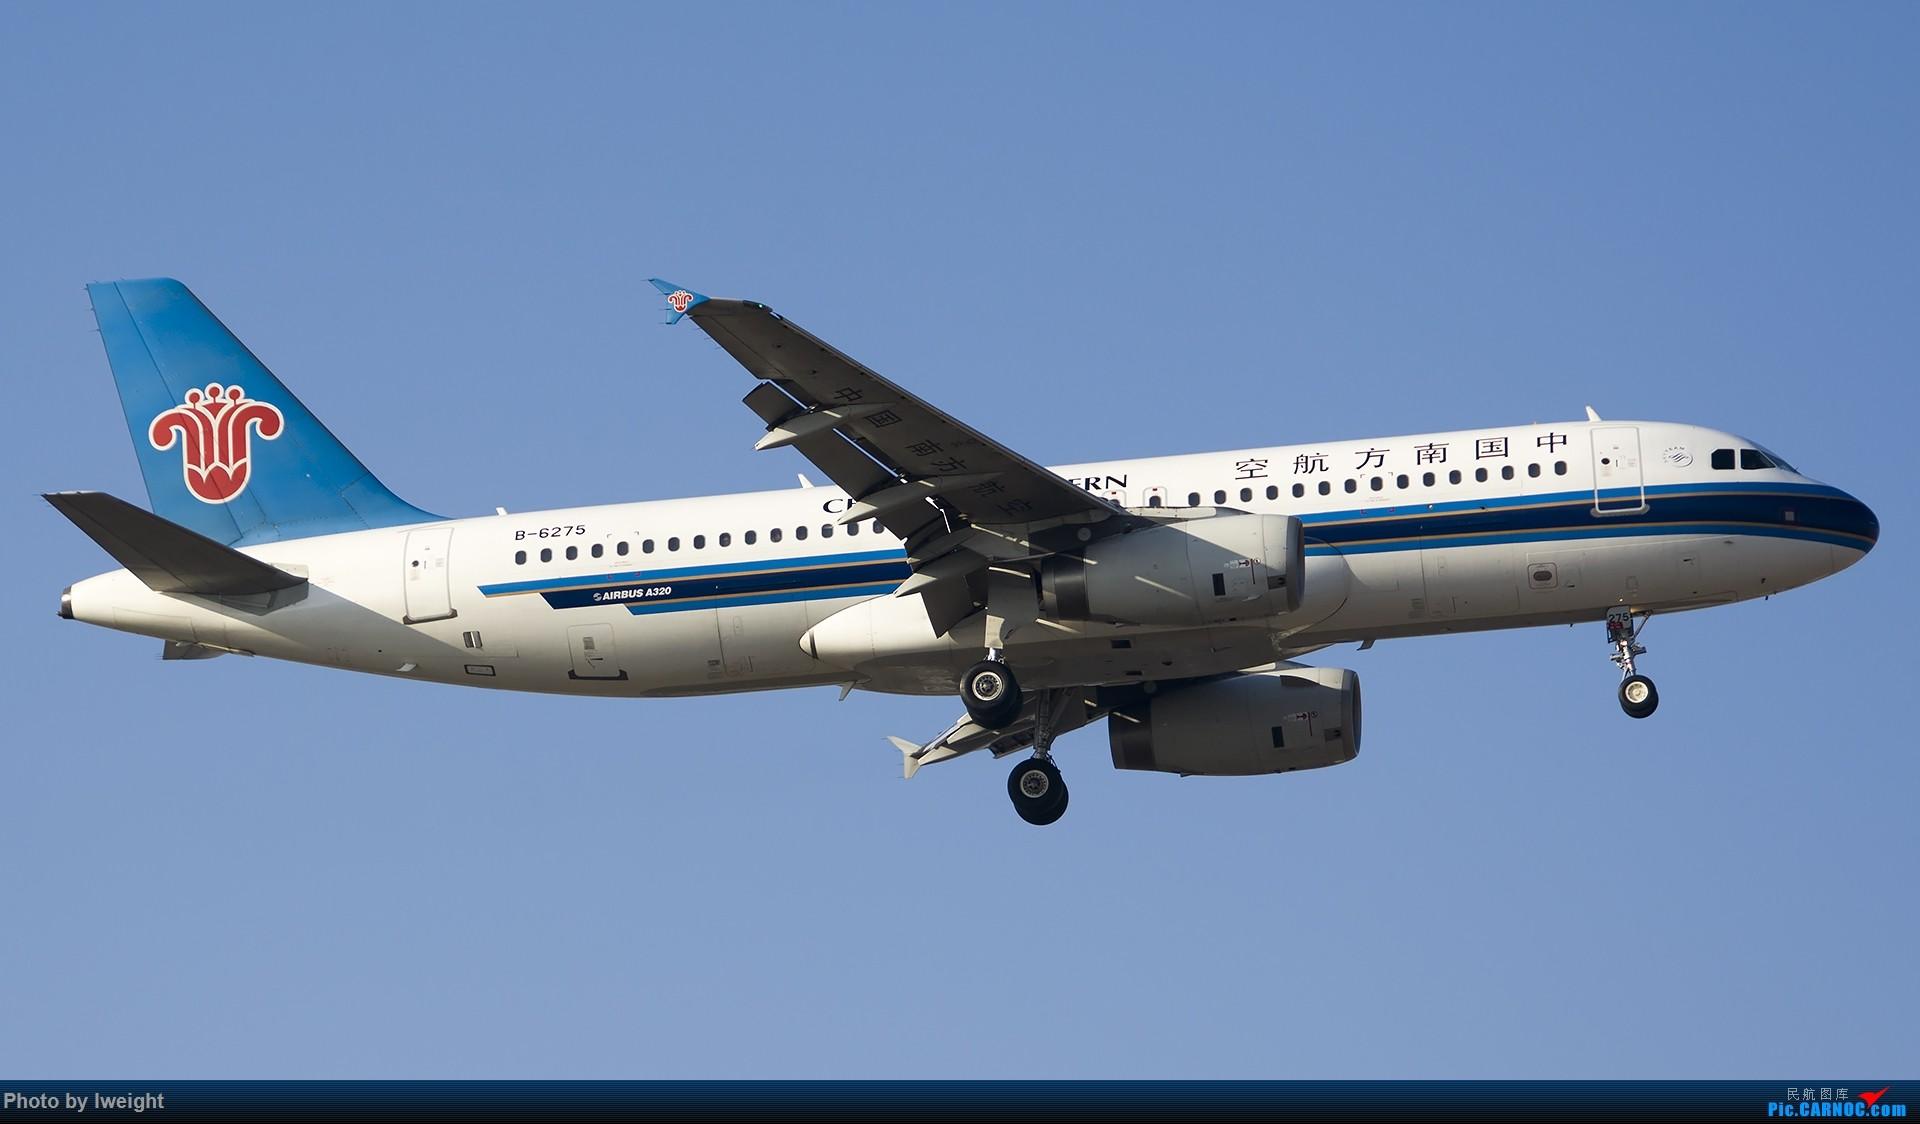 Re:[原创]庆祝升级777,发上今天在首都机场拍的所有飞机【2014-12-14】 AIRBUS A320-200 B-6275 中国北京首都国际机场